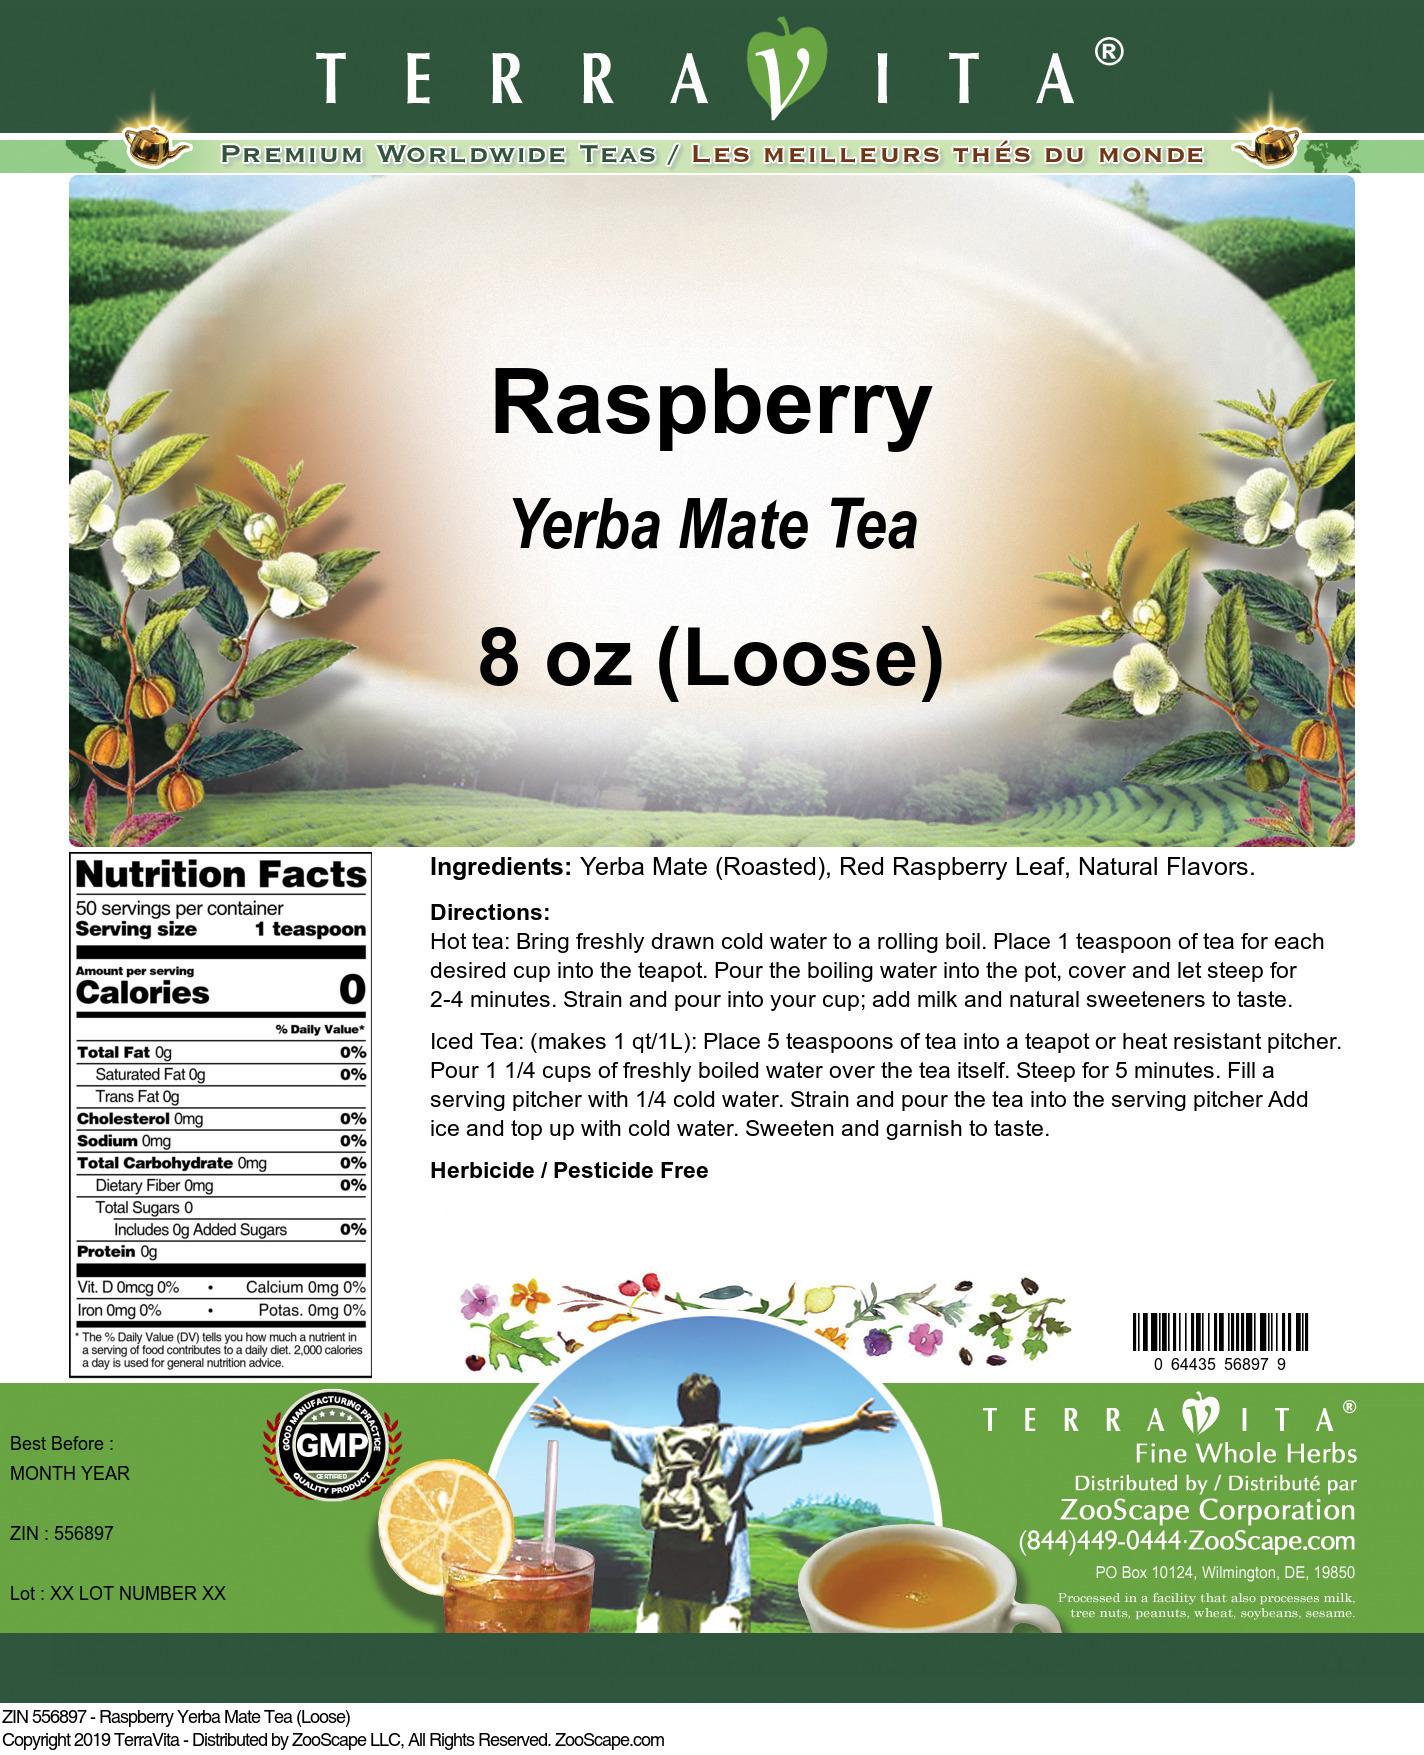 Raspberry Yerba Mate Tea (Loose)